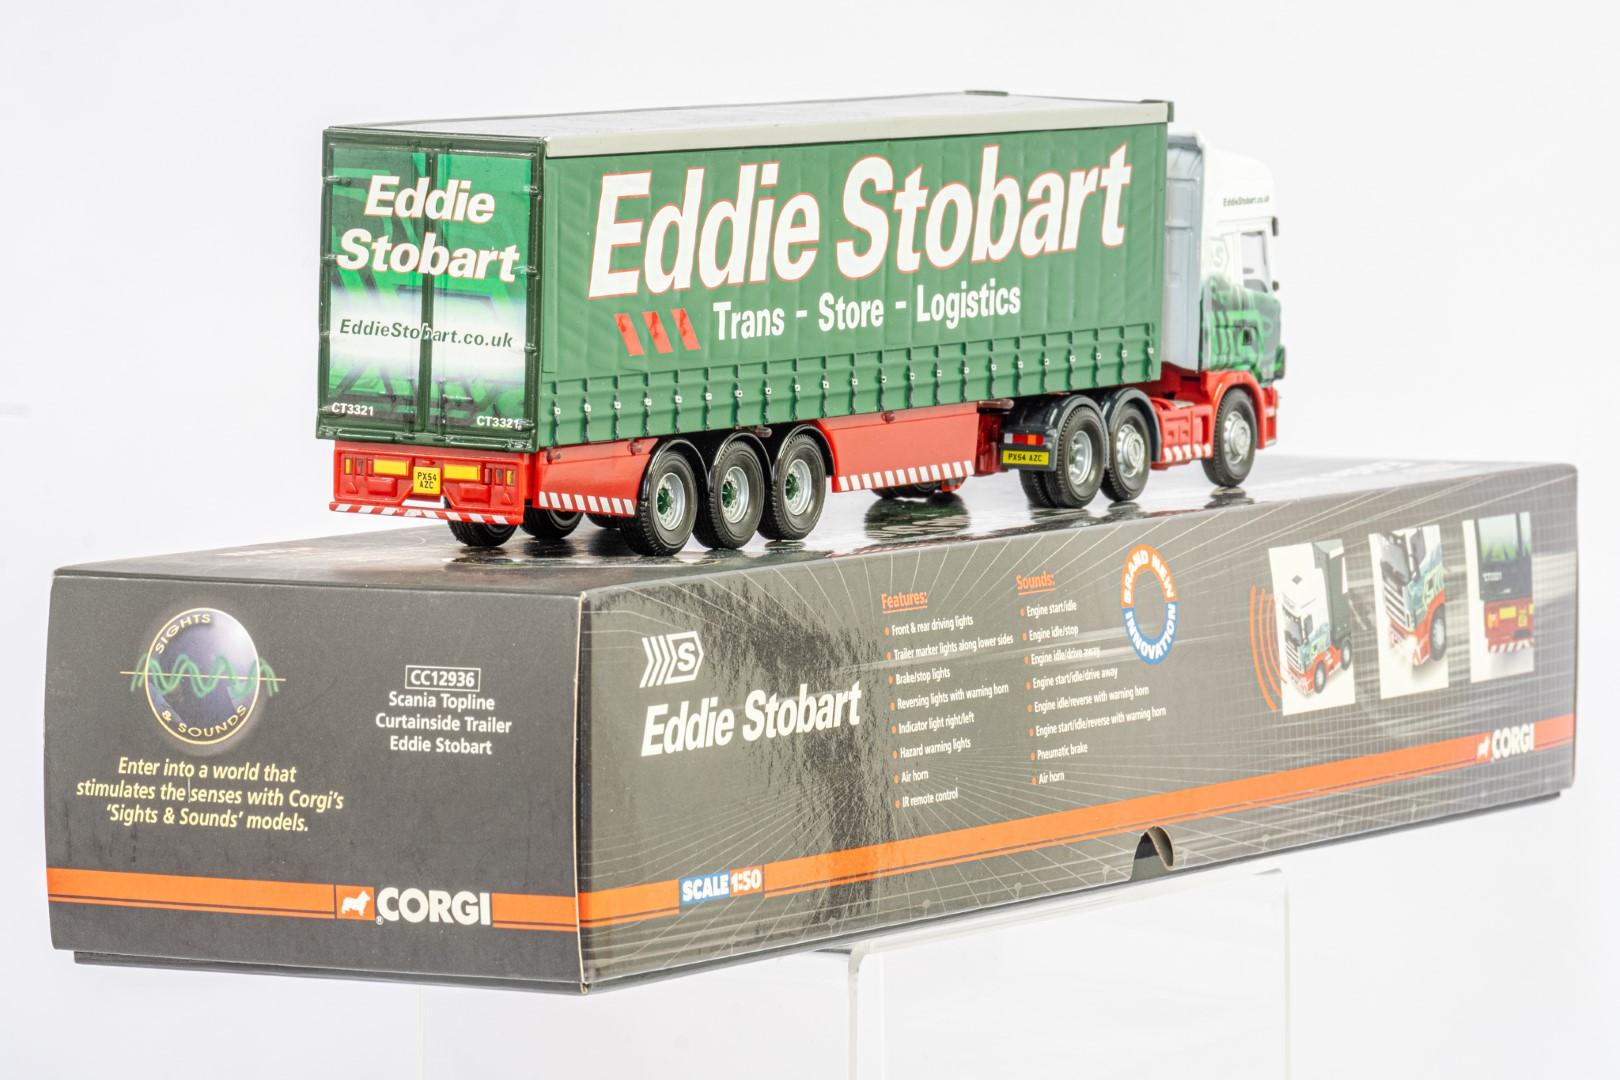 Corgi Scania Topline Curtainside Trailer - Eddie Stobart - Sights & Sounds - Image 3 of 3